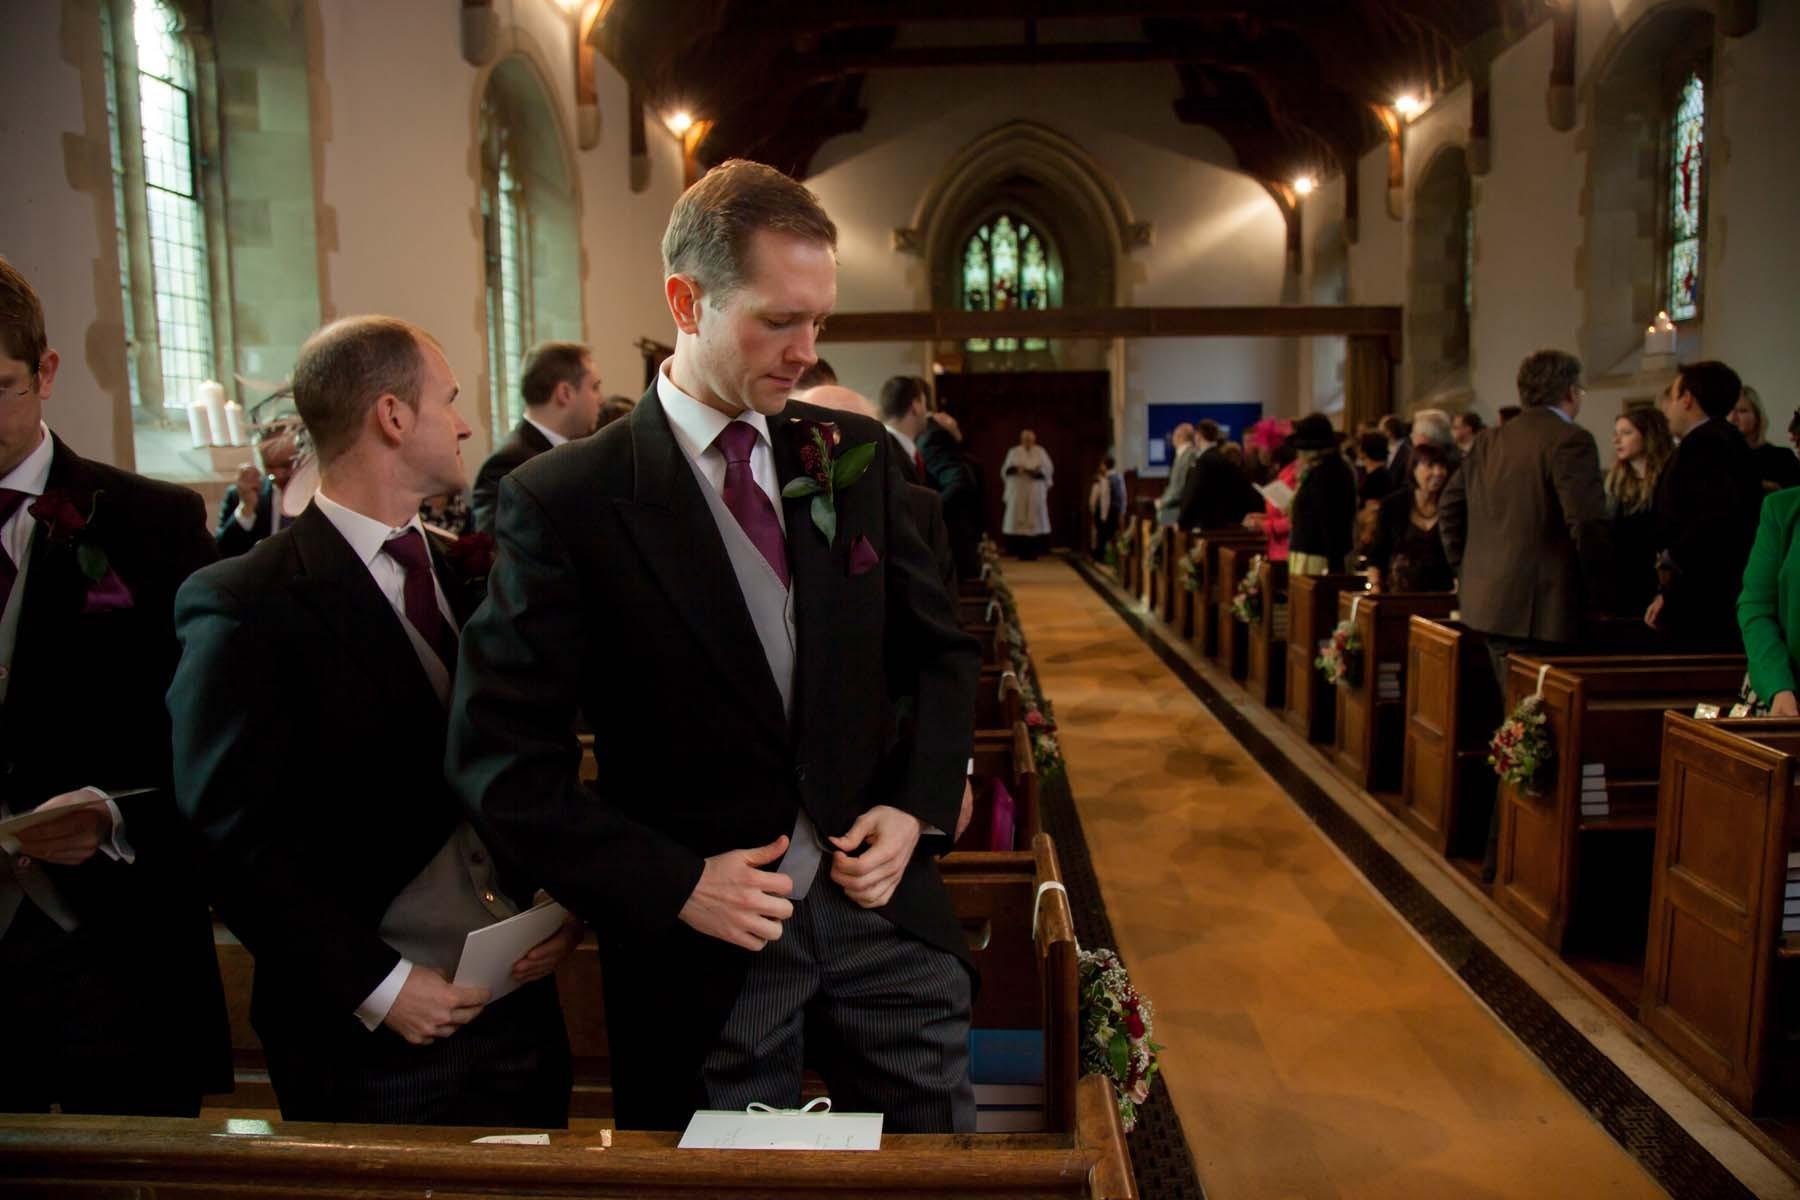 Sussex & Surrey Wedding Photographer - Ceremony (8)